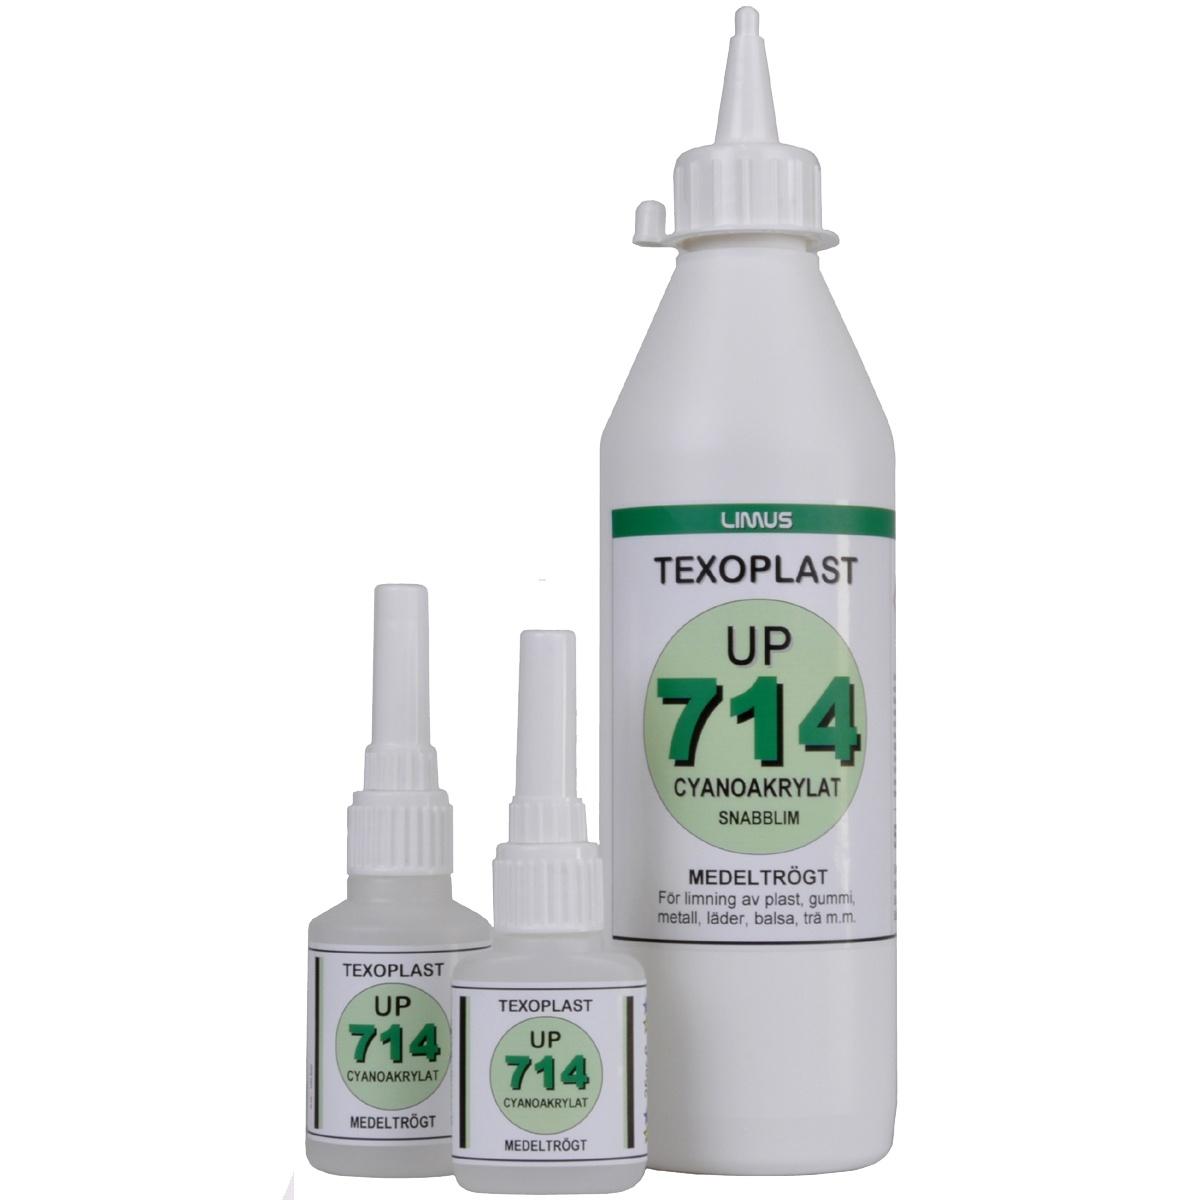 TEXOPLAST UP714